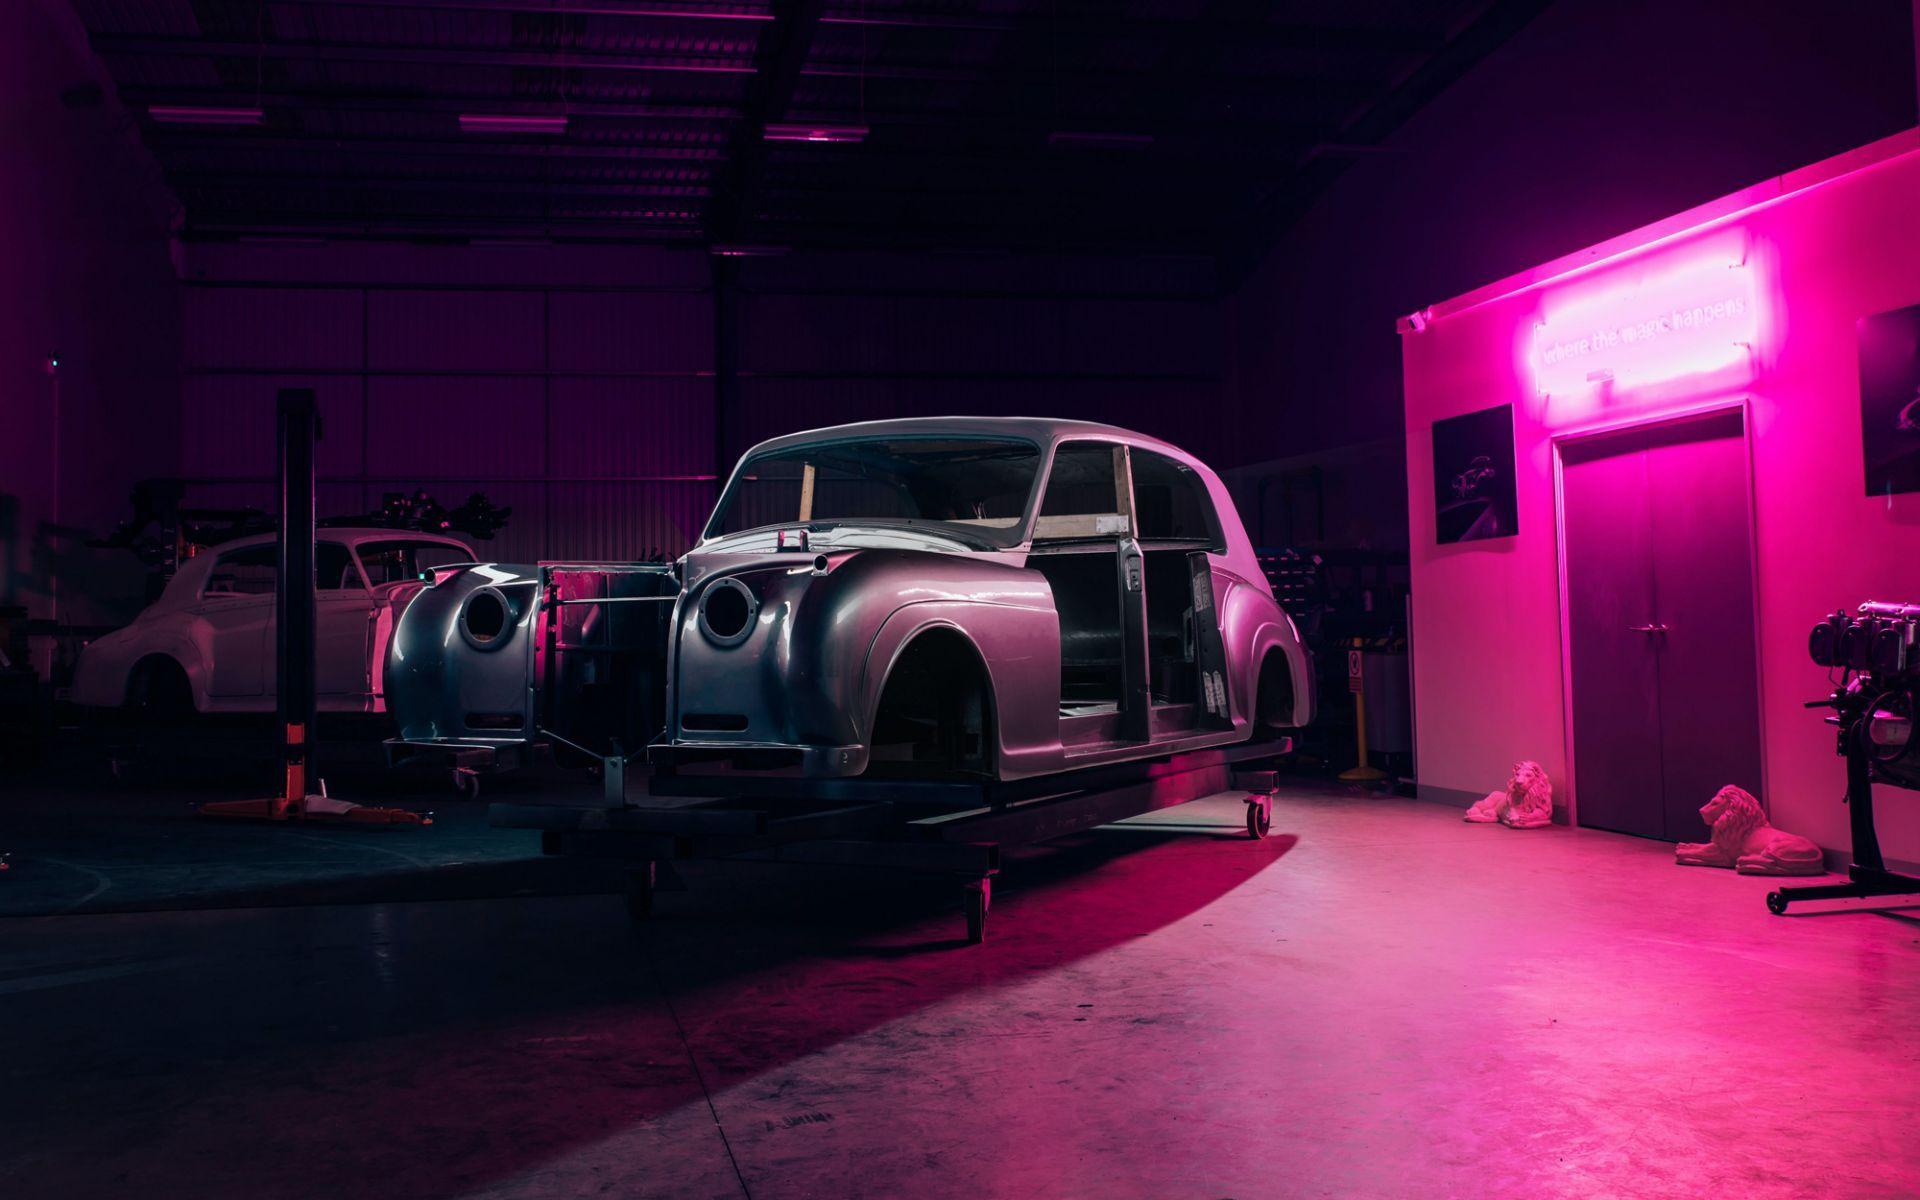 Electris-Rolls-Royce-Phantom-V-and-Silver-Cloud-by-Lunaz-24